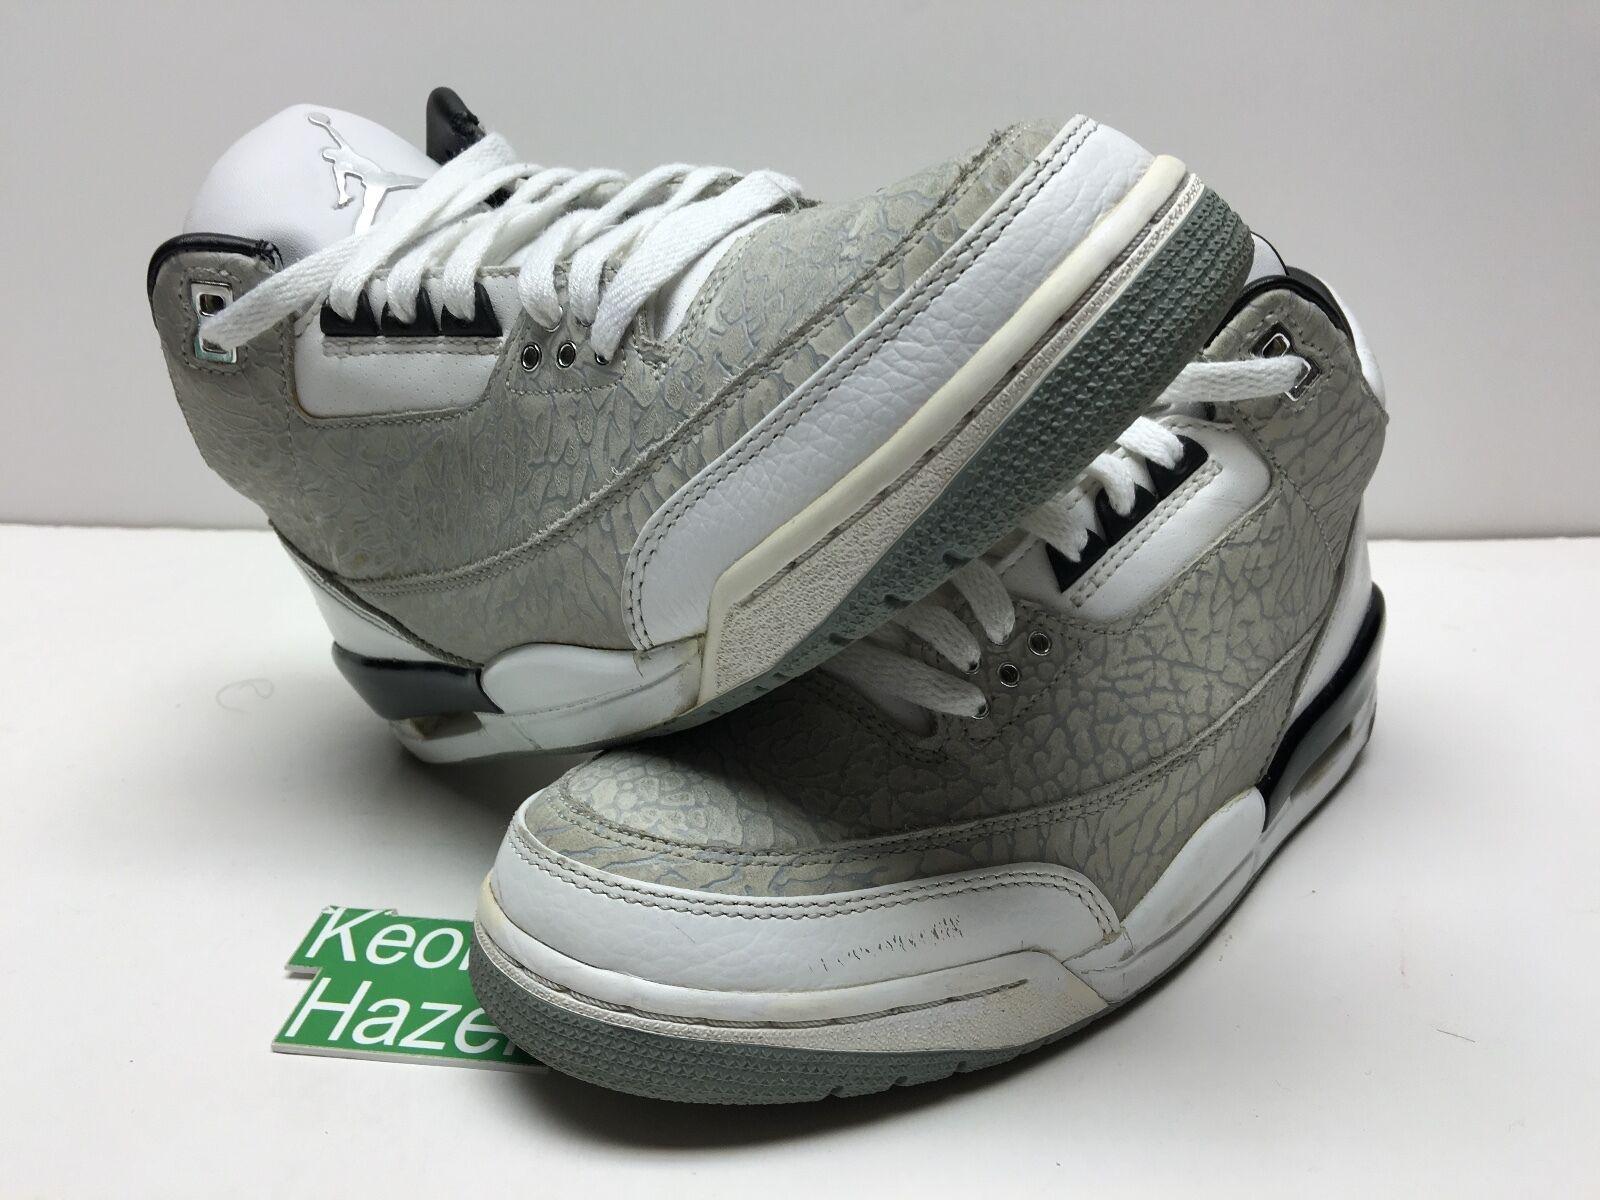 Nike Air Jordan 3 III Retro Flip True Blue Cavs Bred Cement Fear Pack OVO Sz 8.5 Brand discount